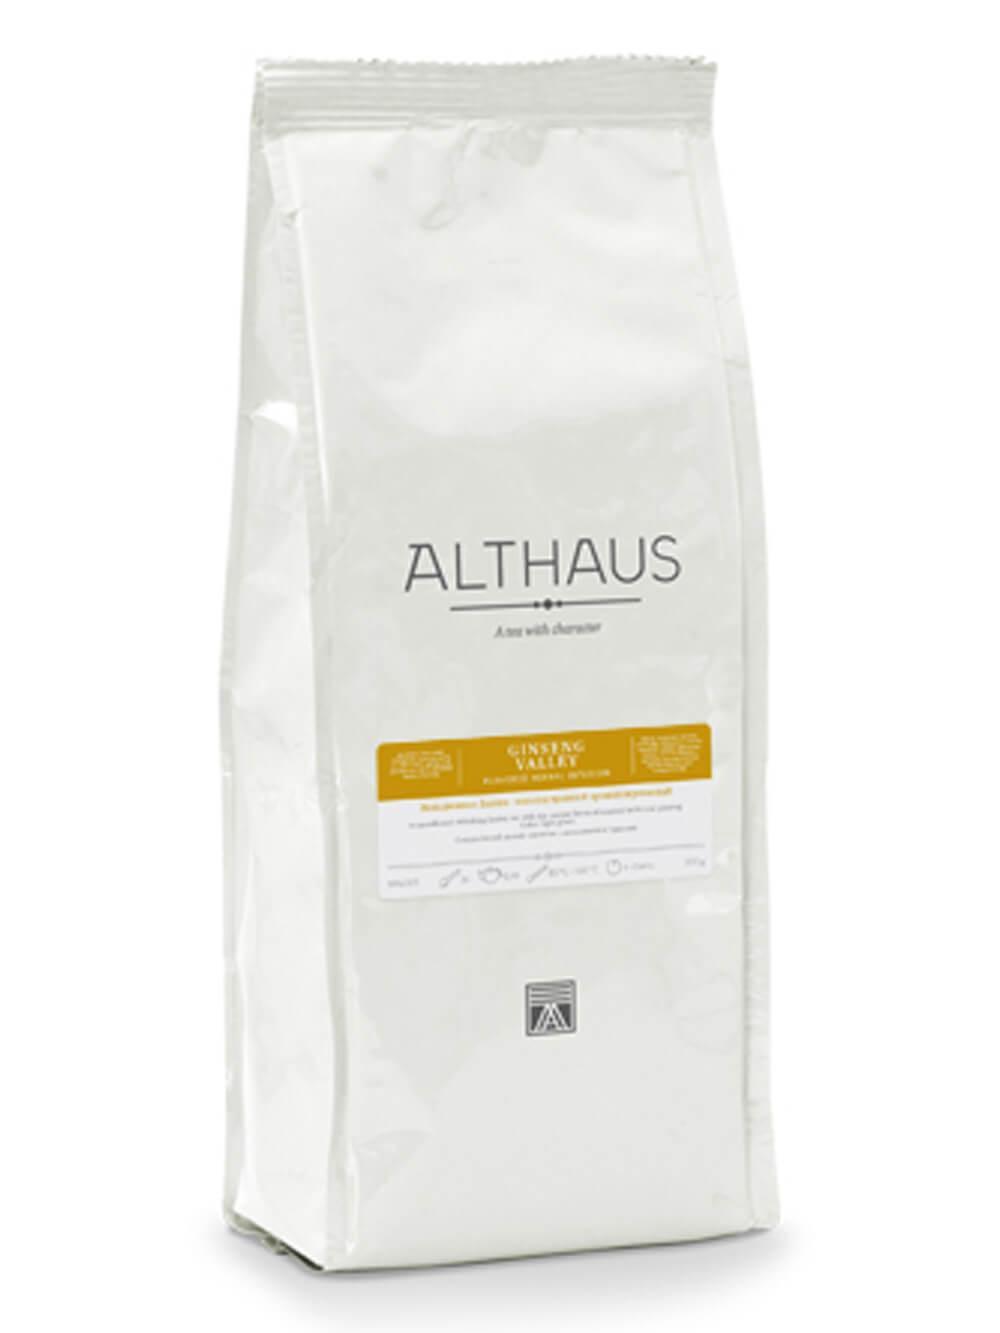 Чай травяной Althaus Ginseng Valley листовой